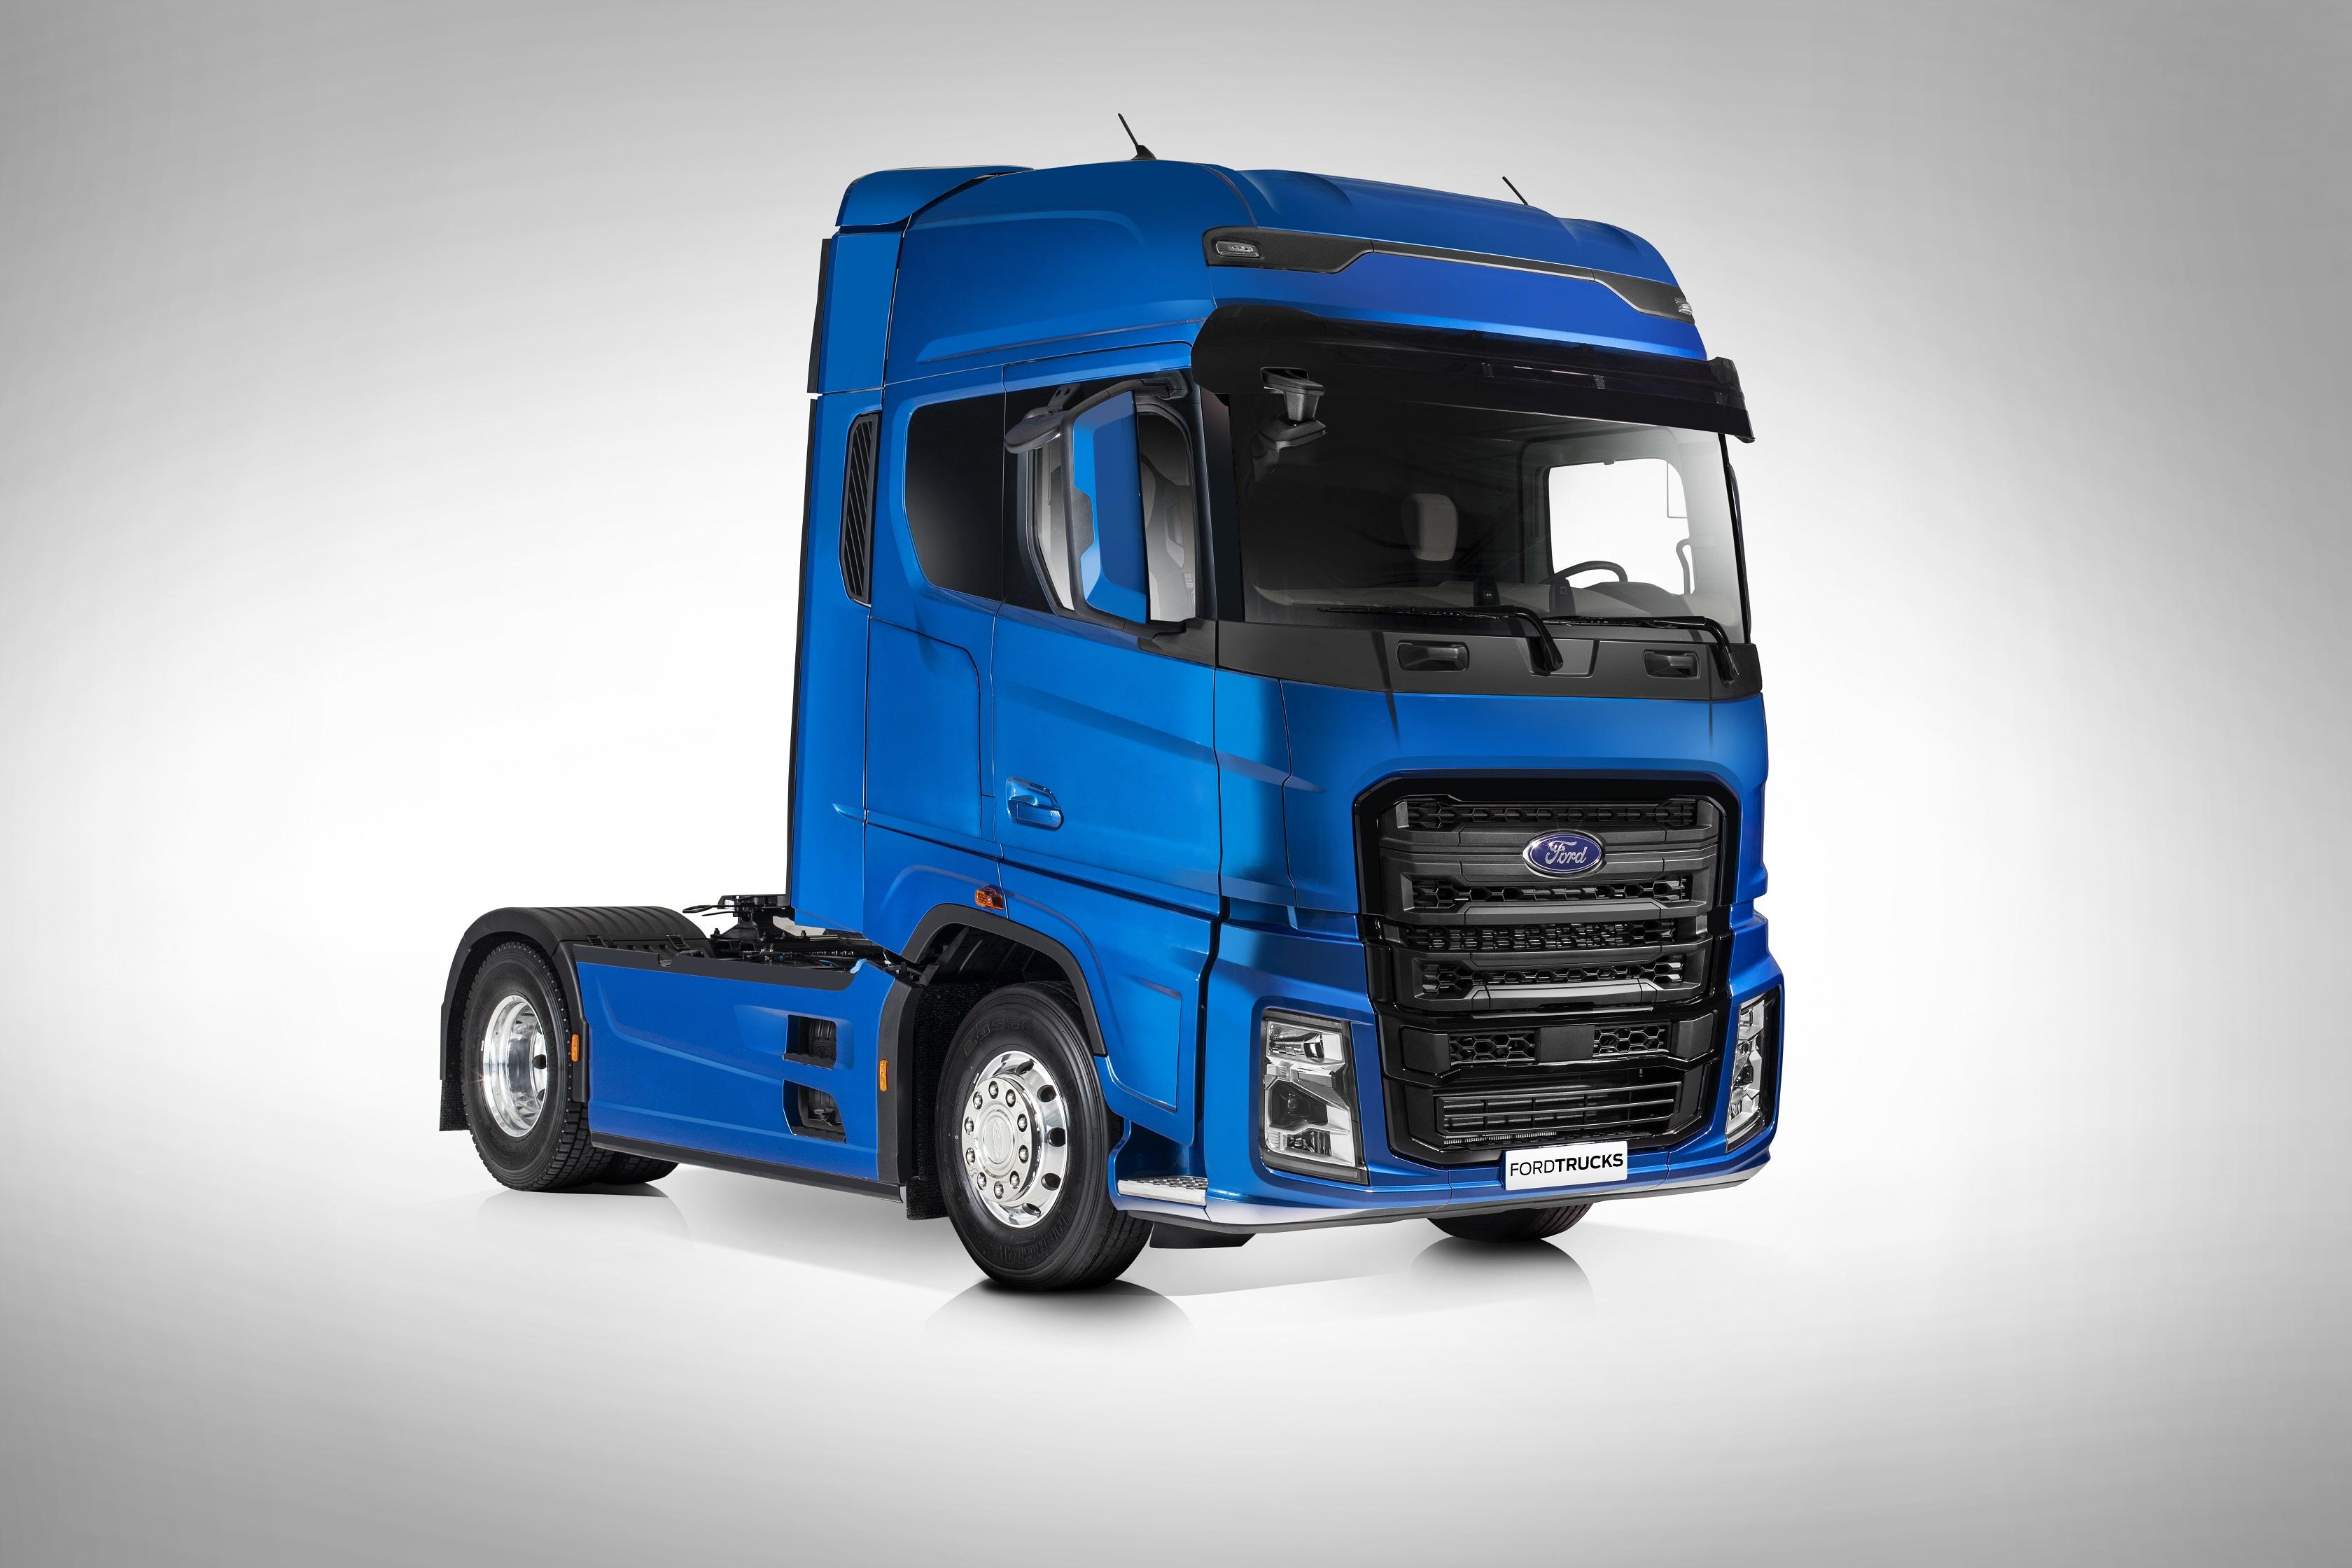 1532513422_Ford_Trucks_Yeni___ekici__1__1